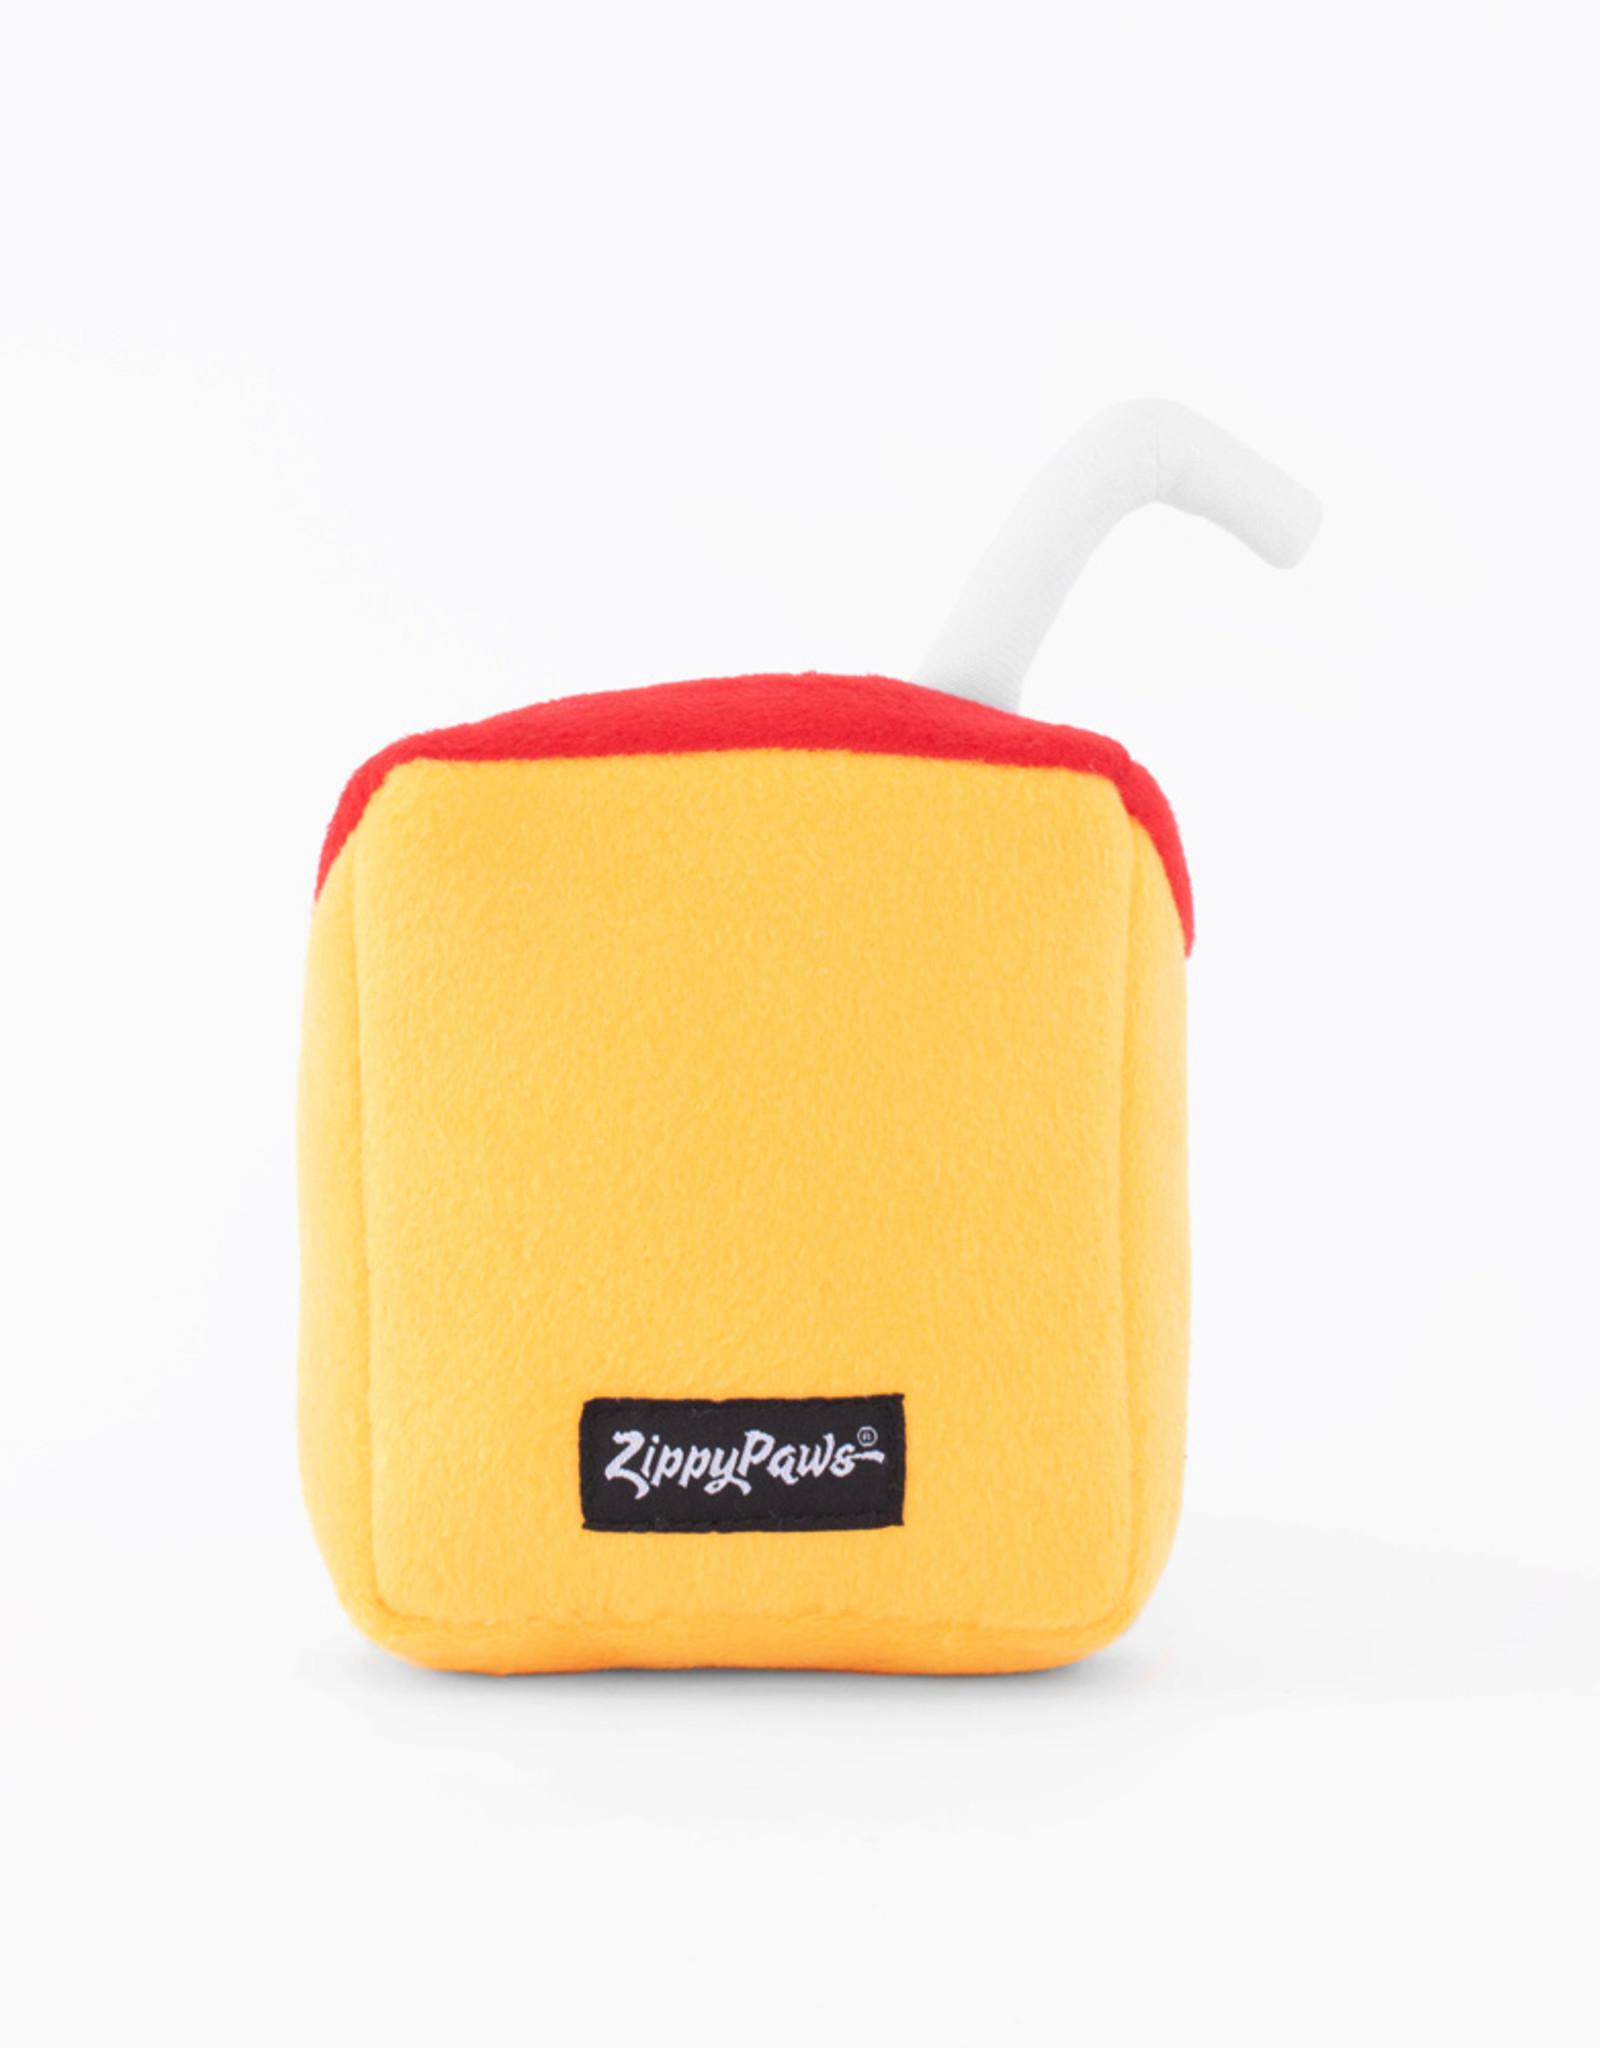 ZippyPaws NomNomz Juice Box